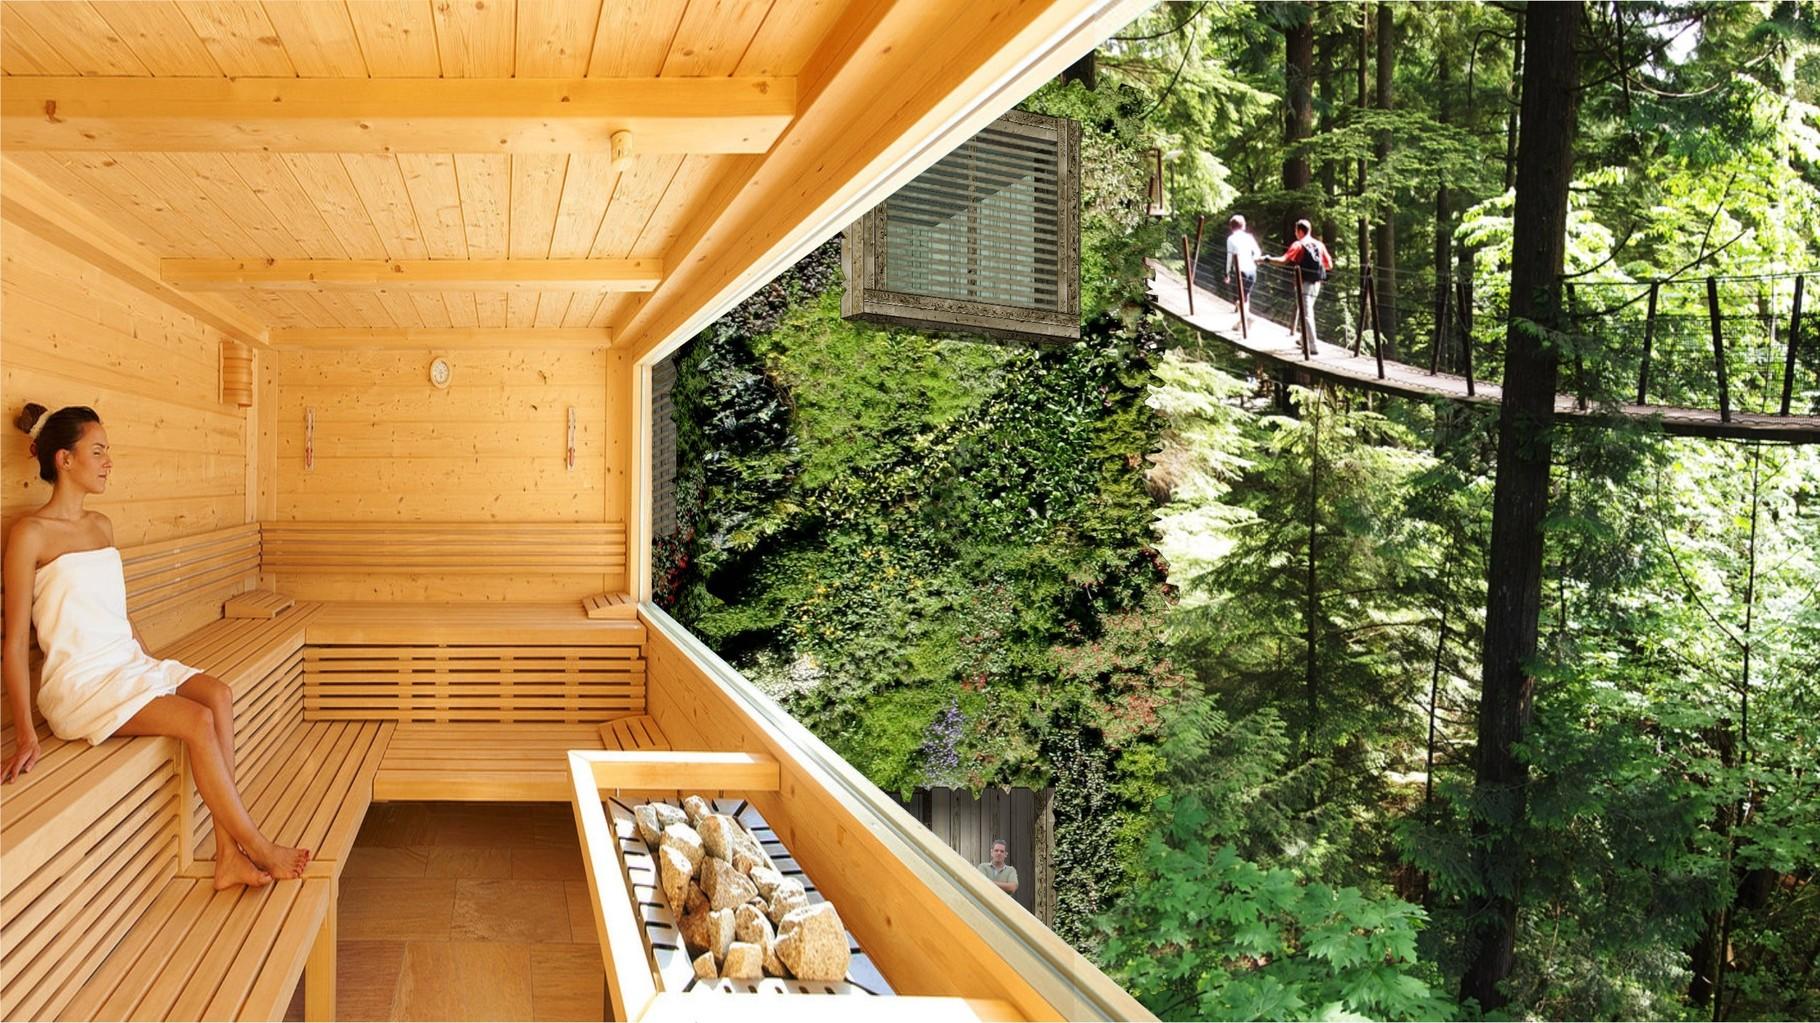 Visual OAS1S™: Enjoy leisure activities as a treehouse sauna or a treetop trekking.